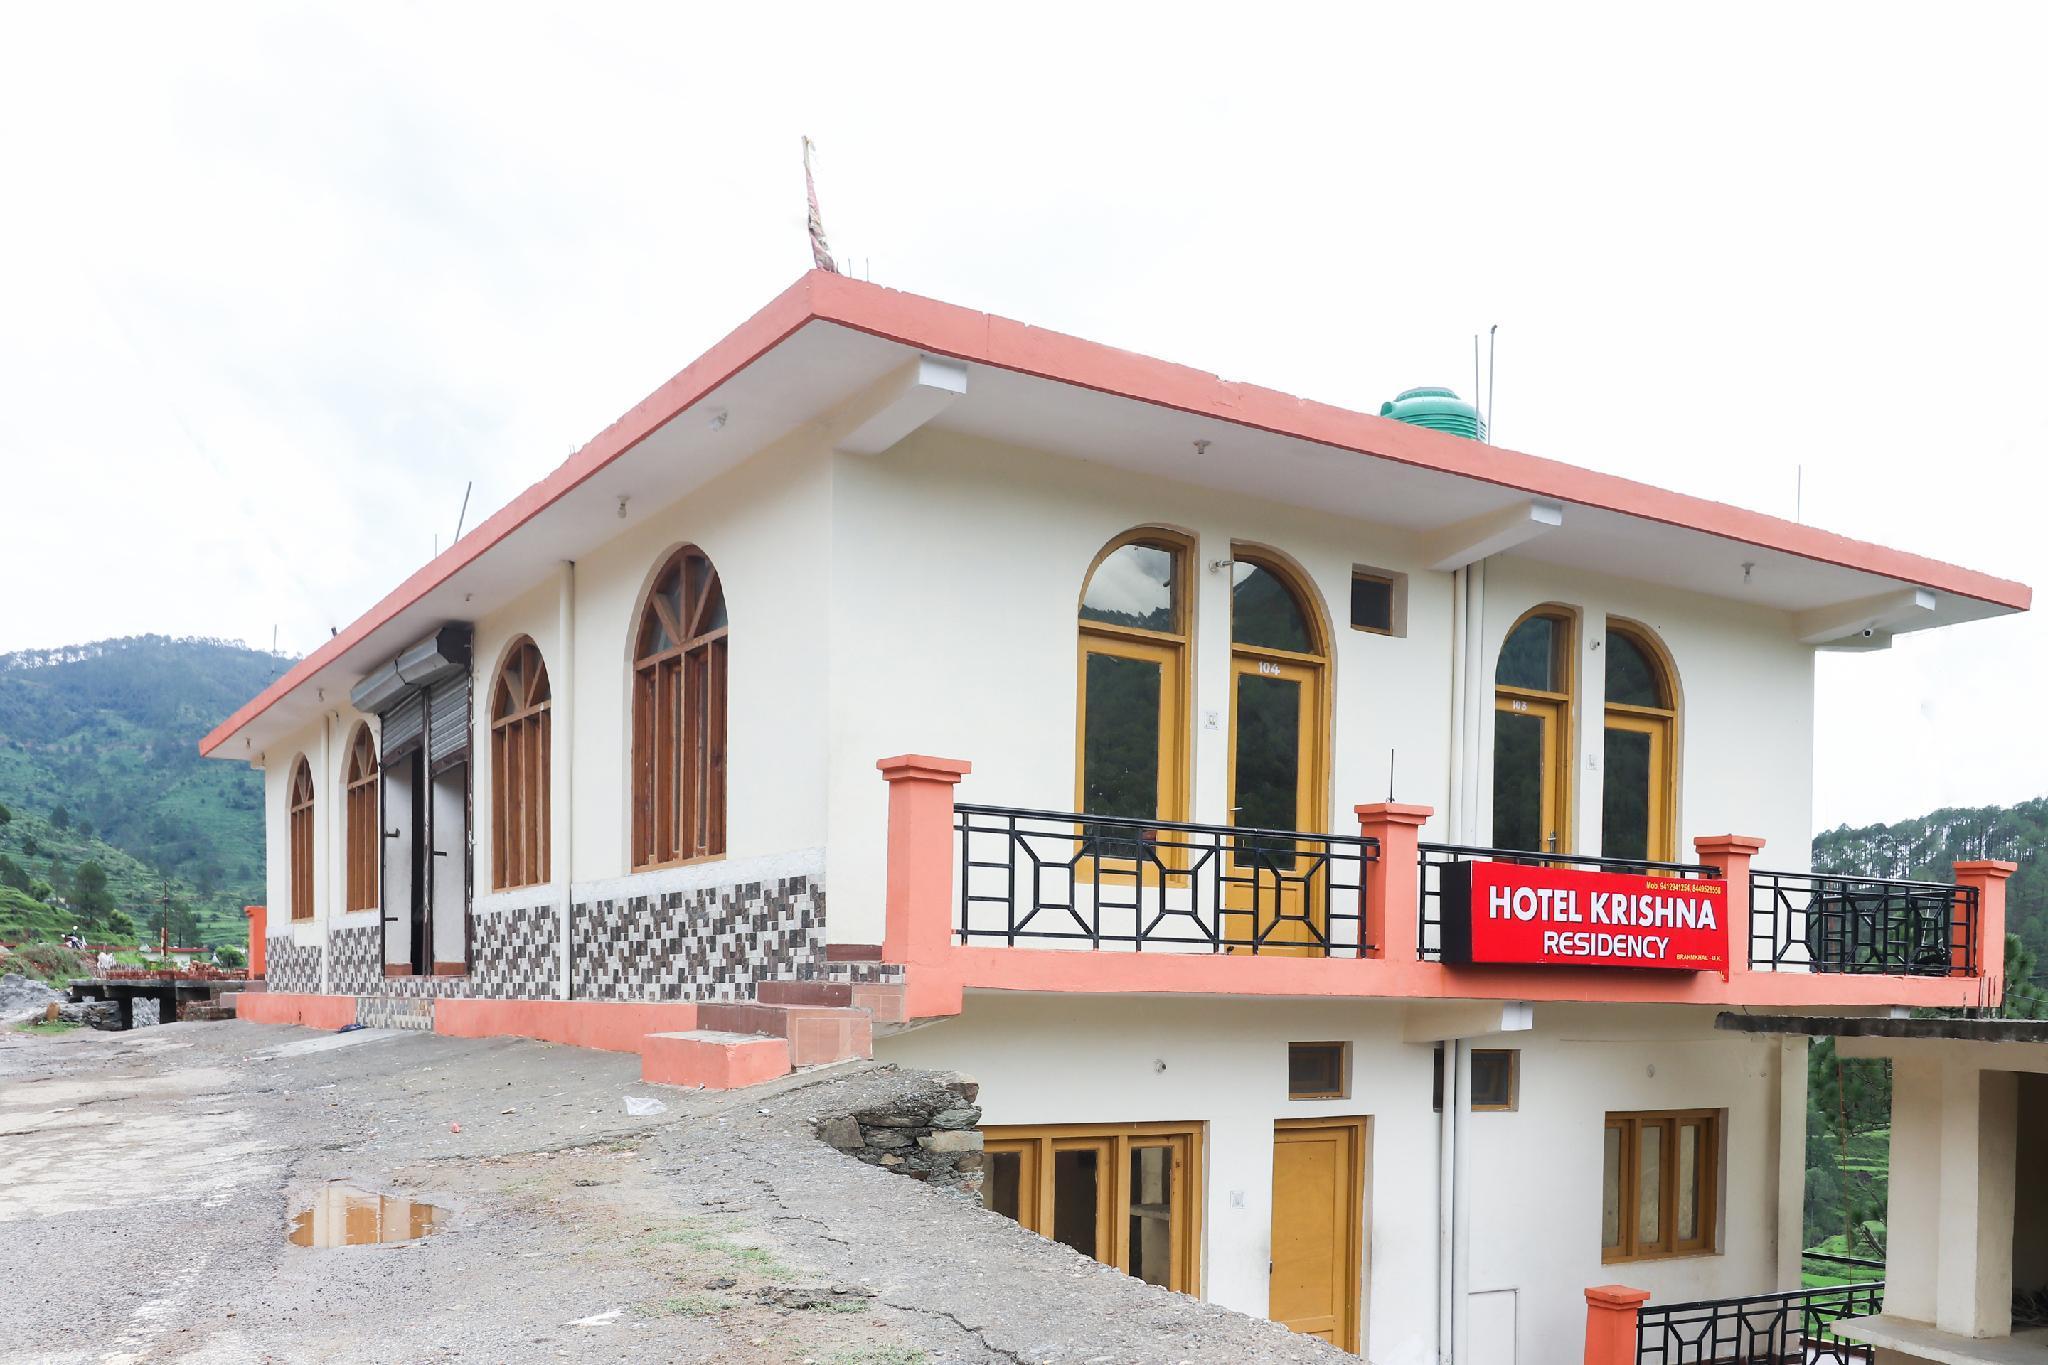 SPOT ON 45345 Hotel Krishna Residency